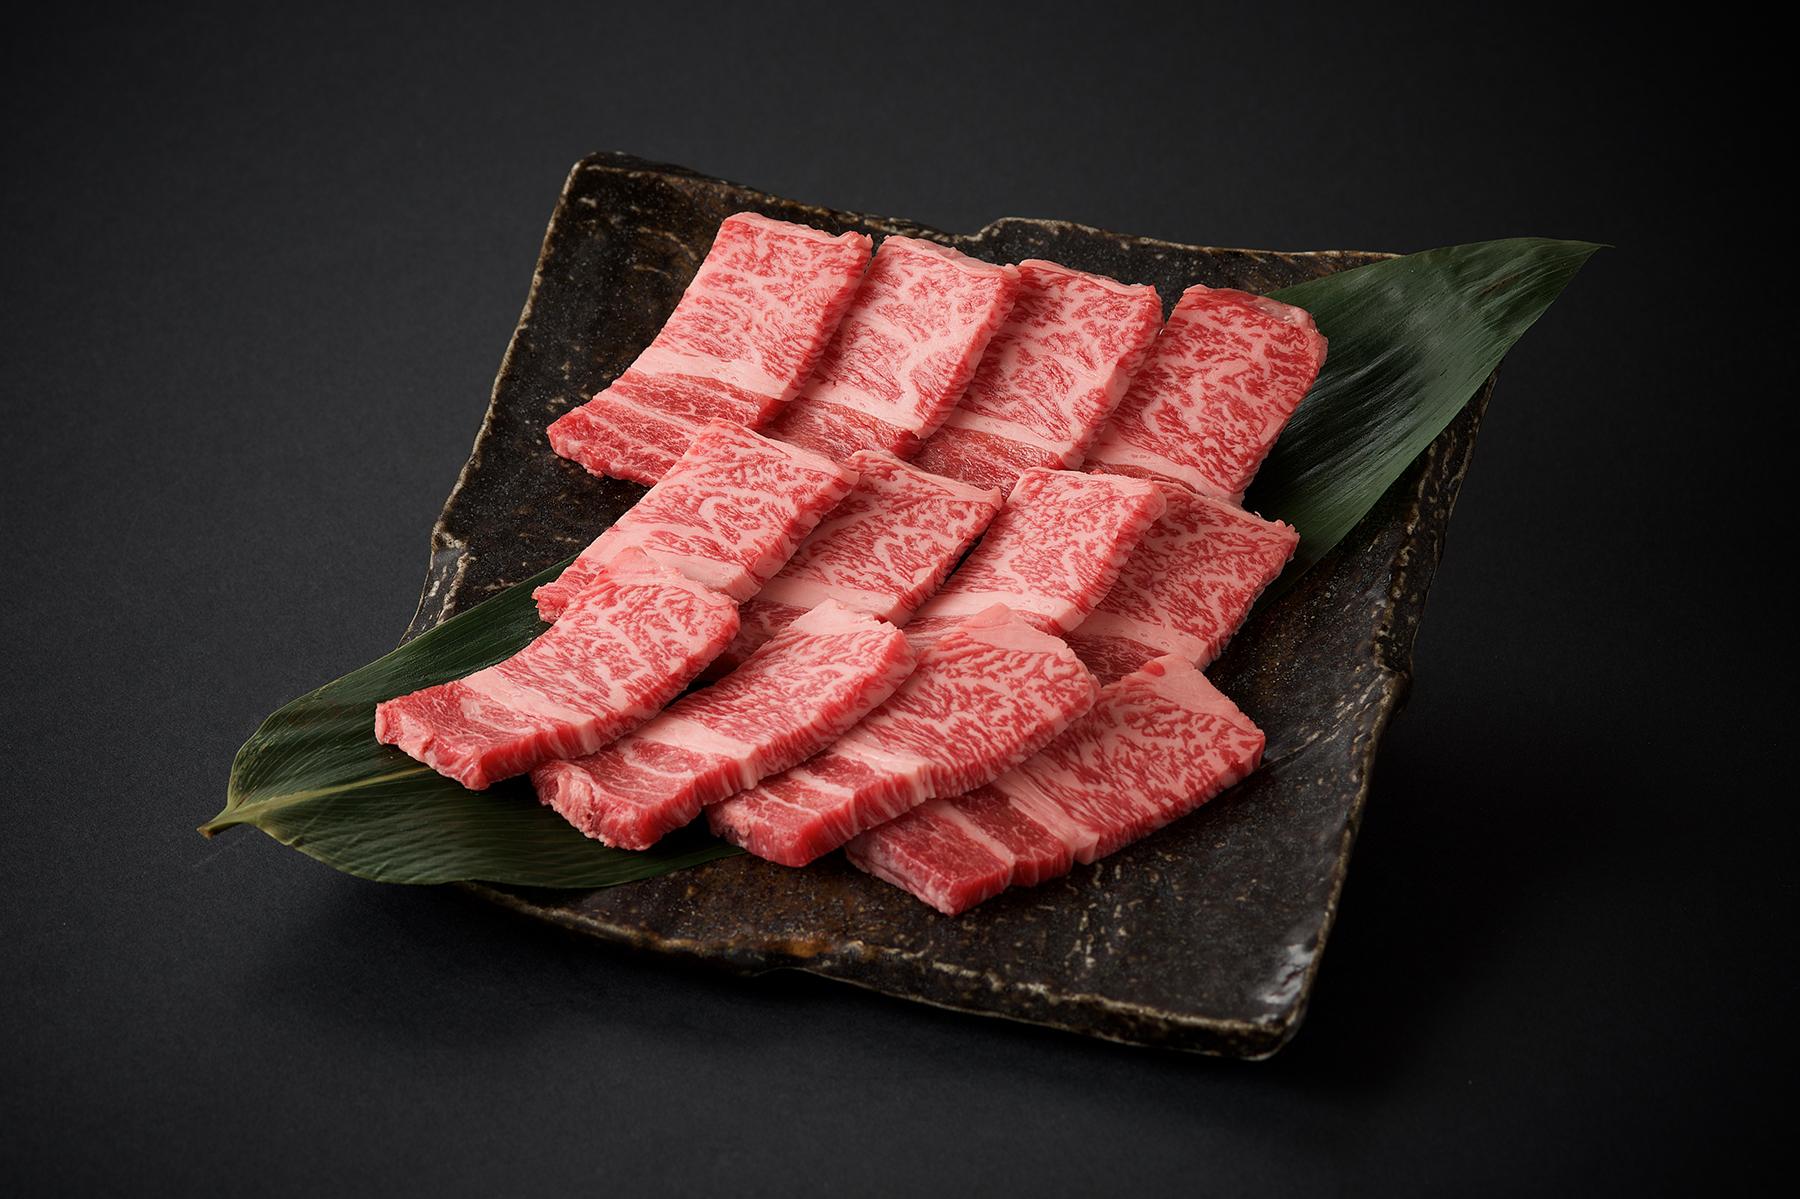 九州産黒毛和牛 ロース焼肉/100g(800)